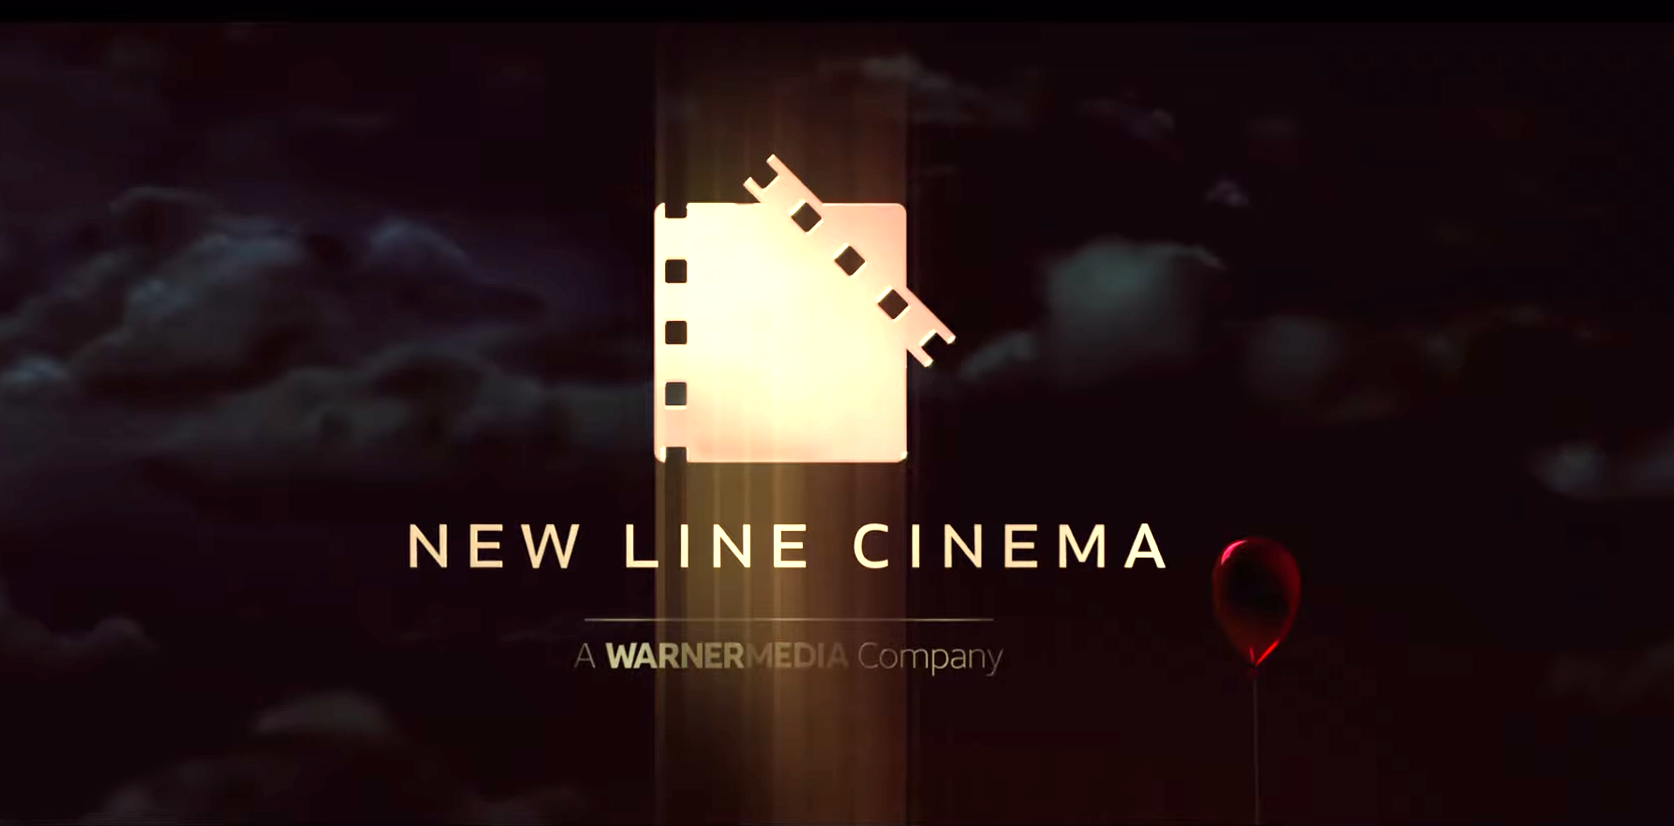 James Wan producirá película original de terror postapocalíptico para New Line Cinema